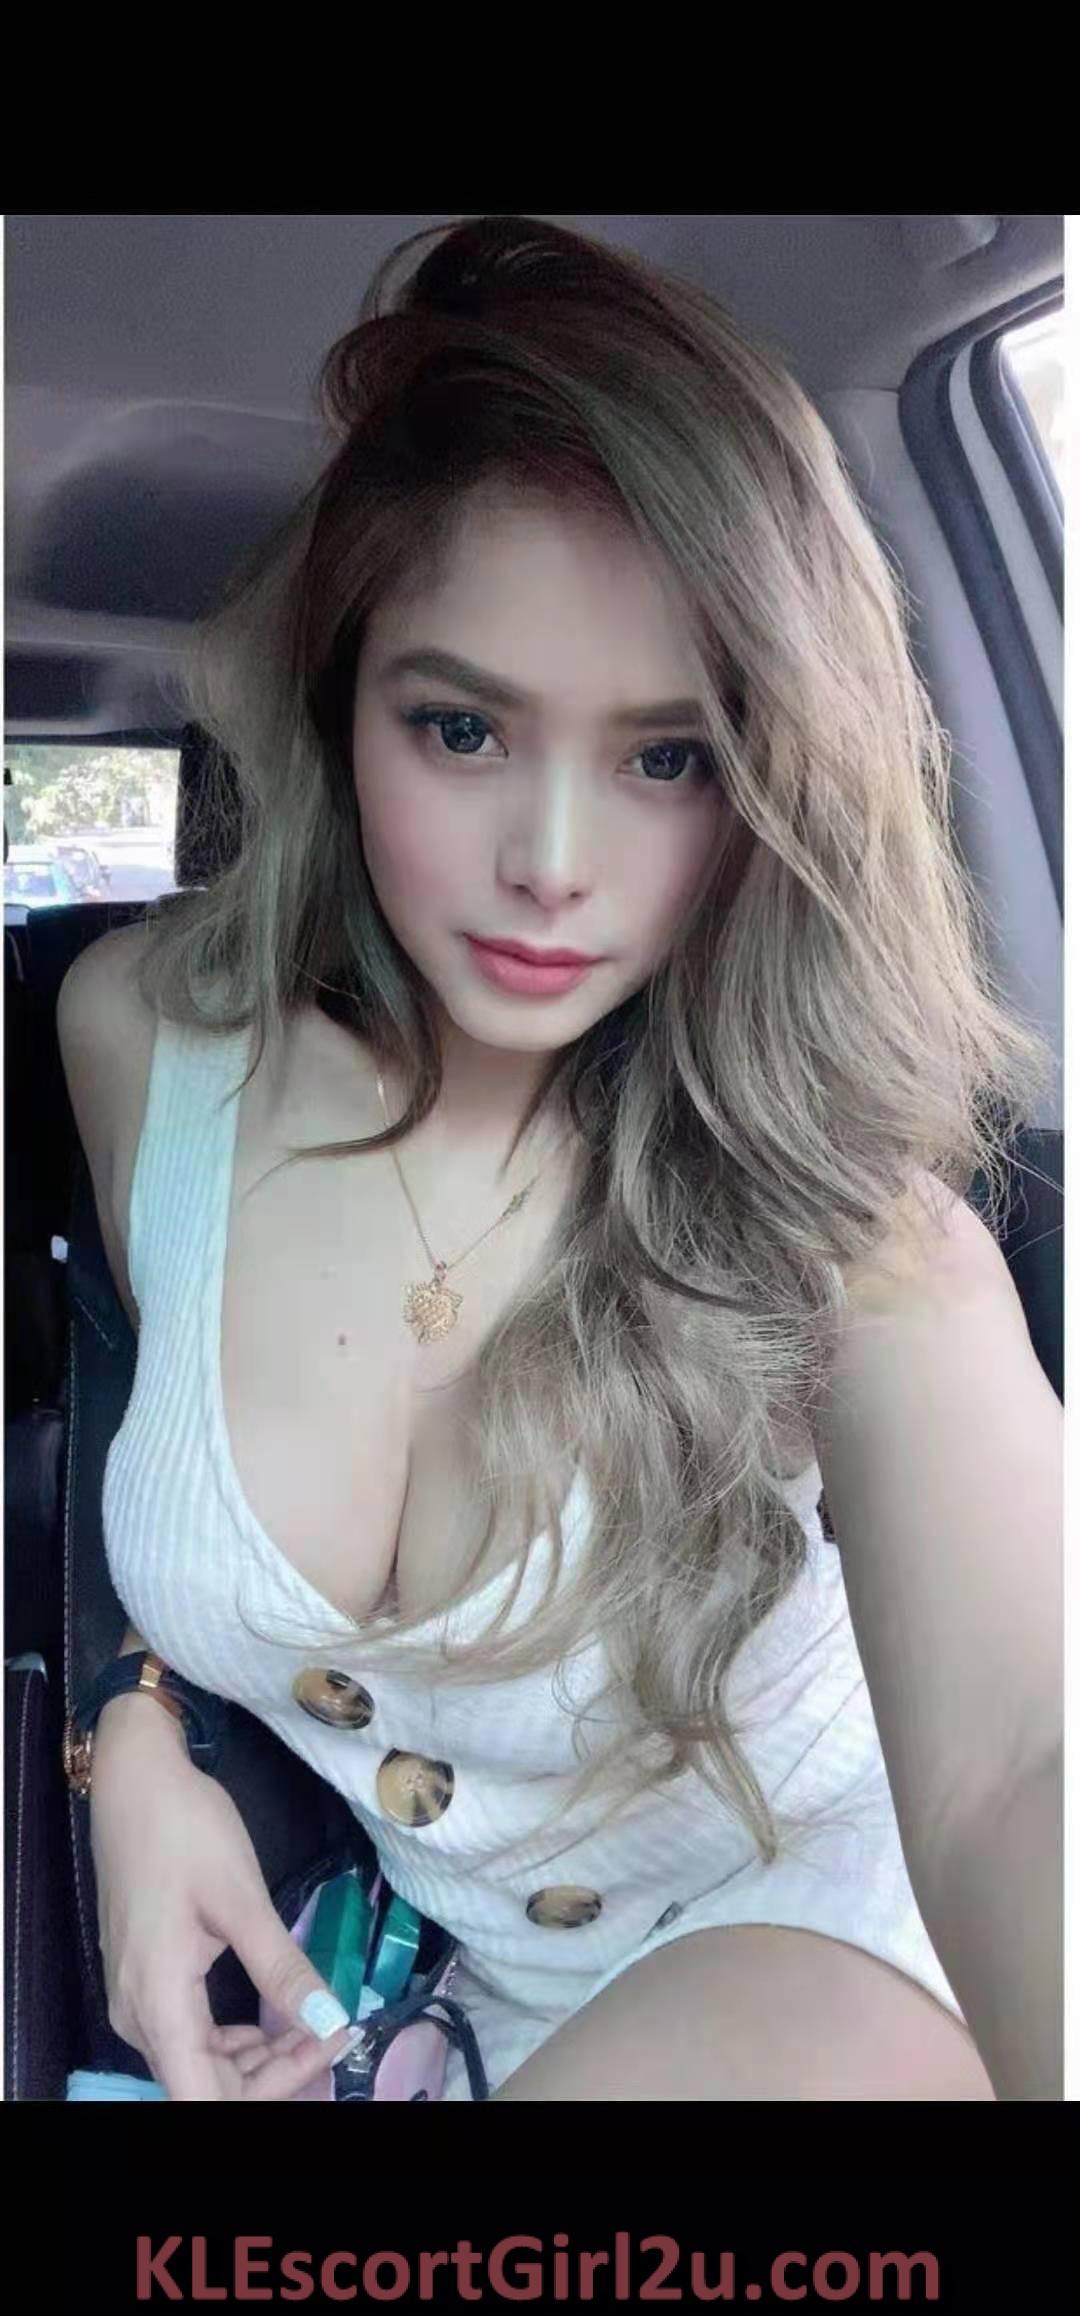 Kl Escort - Hot Sexy Bakso - Bella